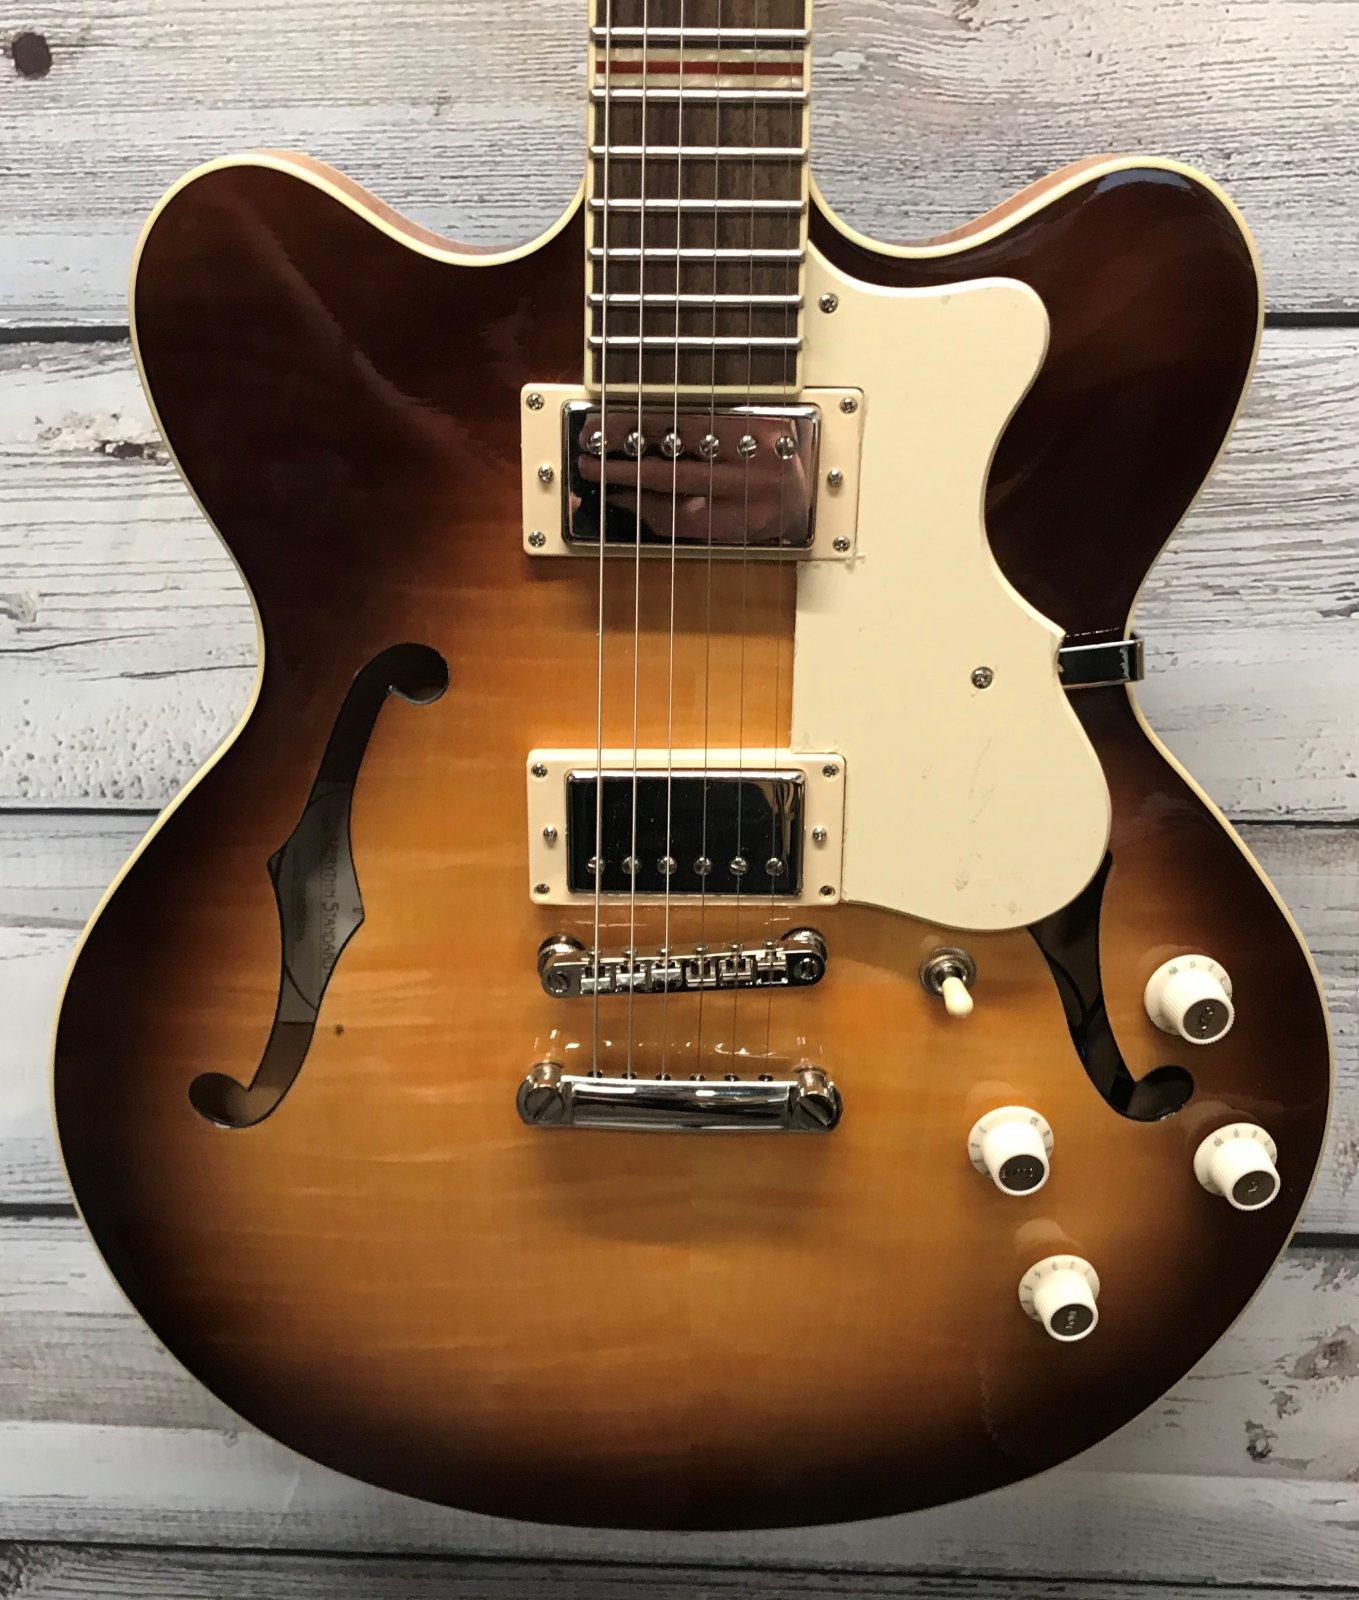 Hofner Contemporary Verythin Guitar, Light Burst Finish W/Case